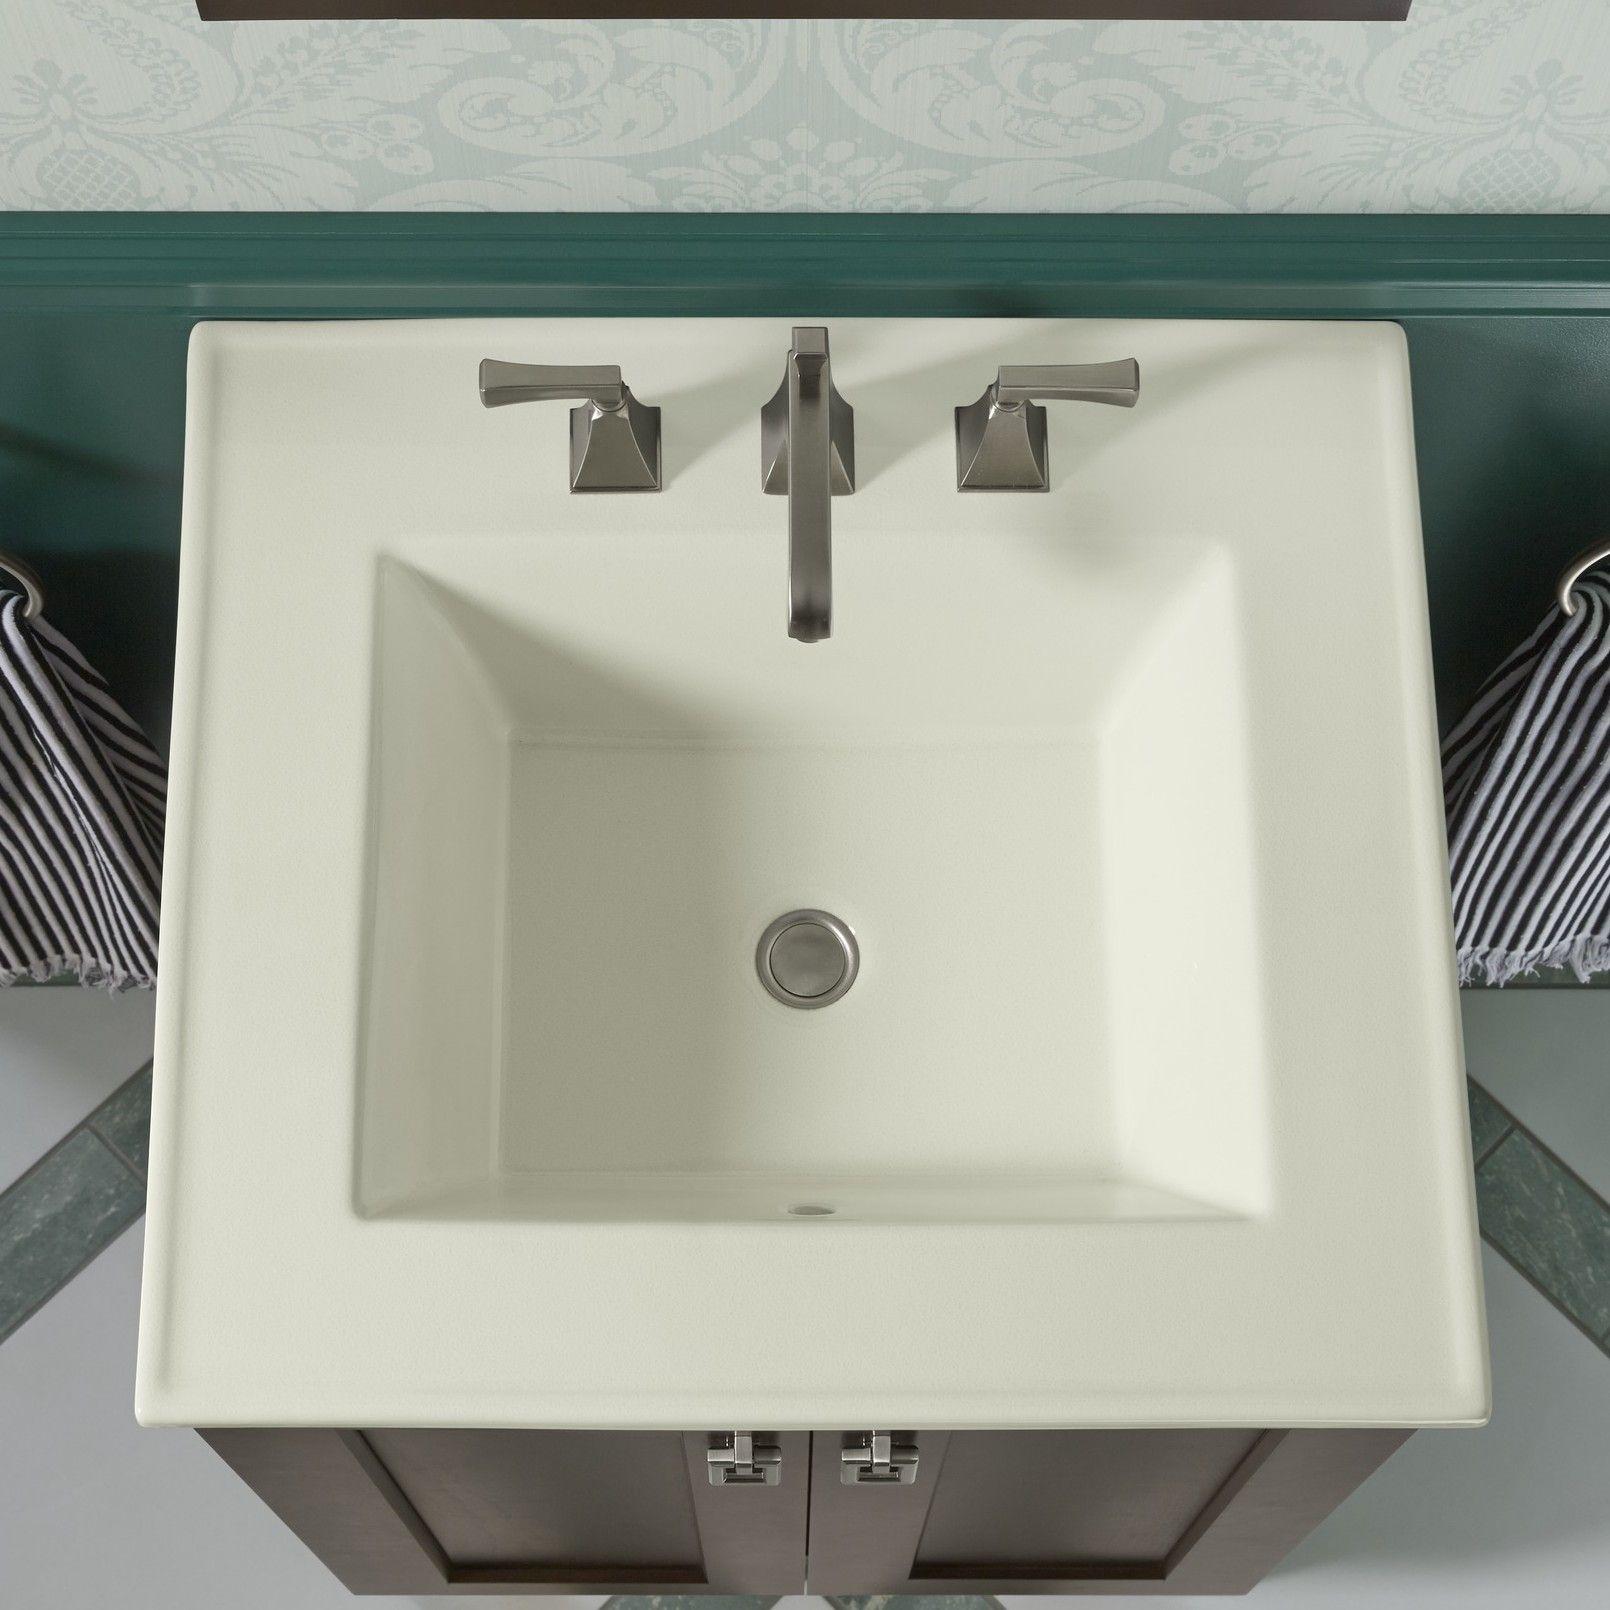 Ceramic Impressions 25 Single Bathroom Vanity Top Drop In